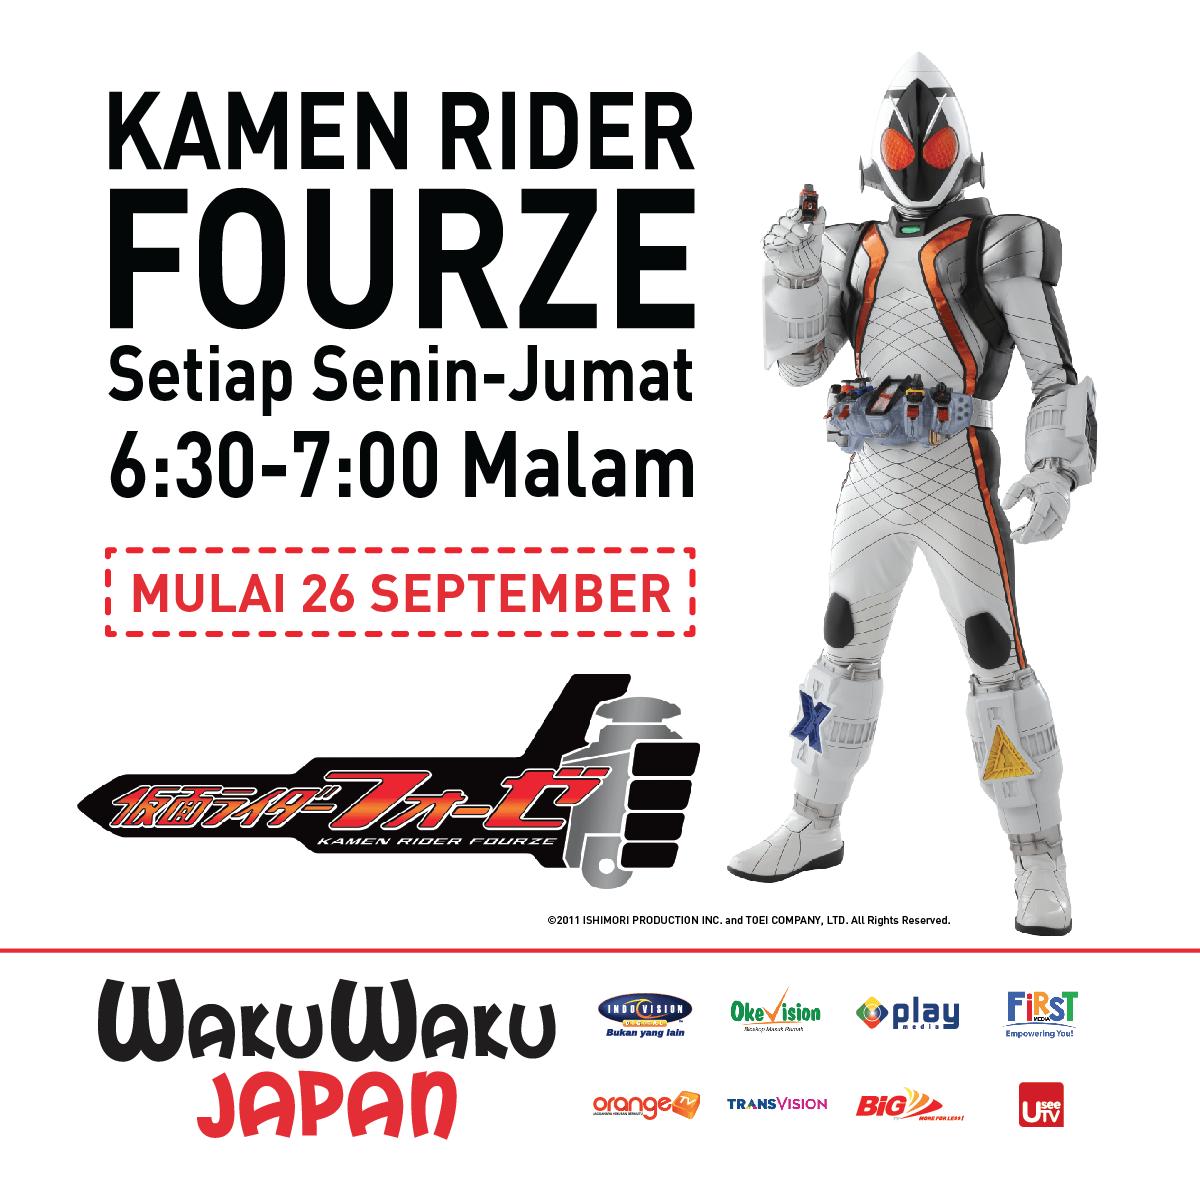 Waku waku japan indonesia